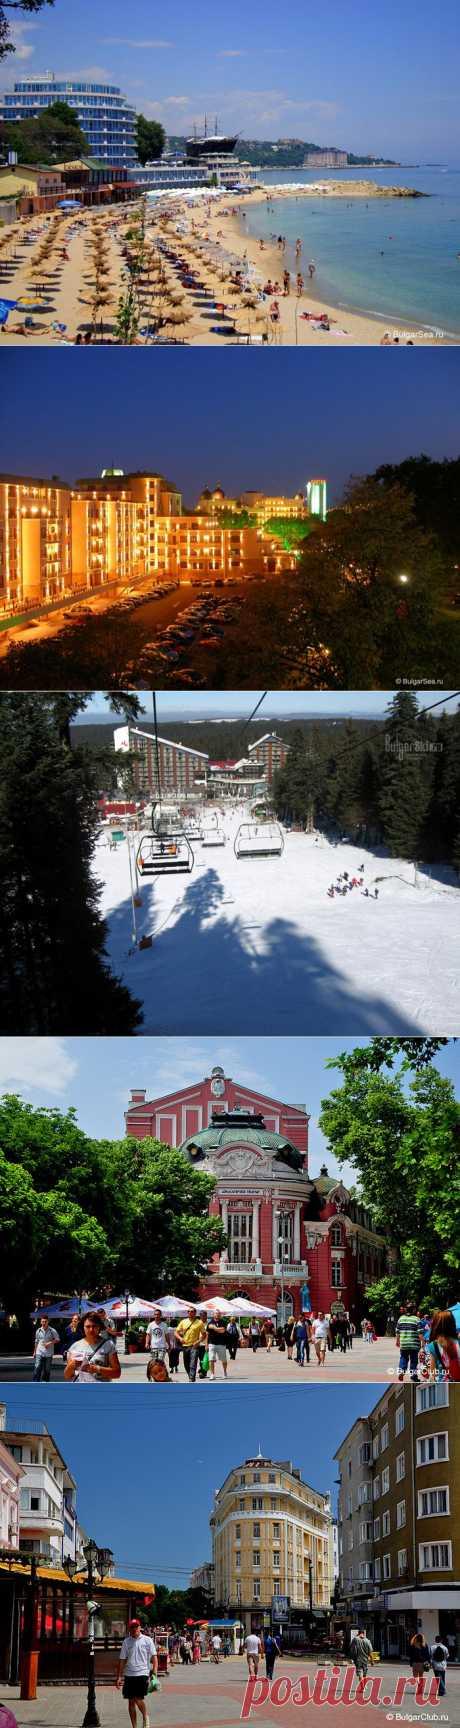 Bulgaria and its resorts.